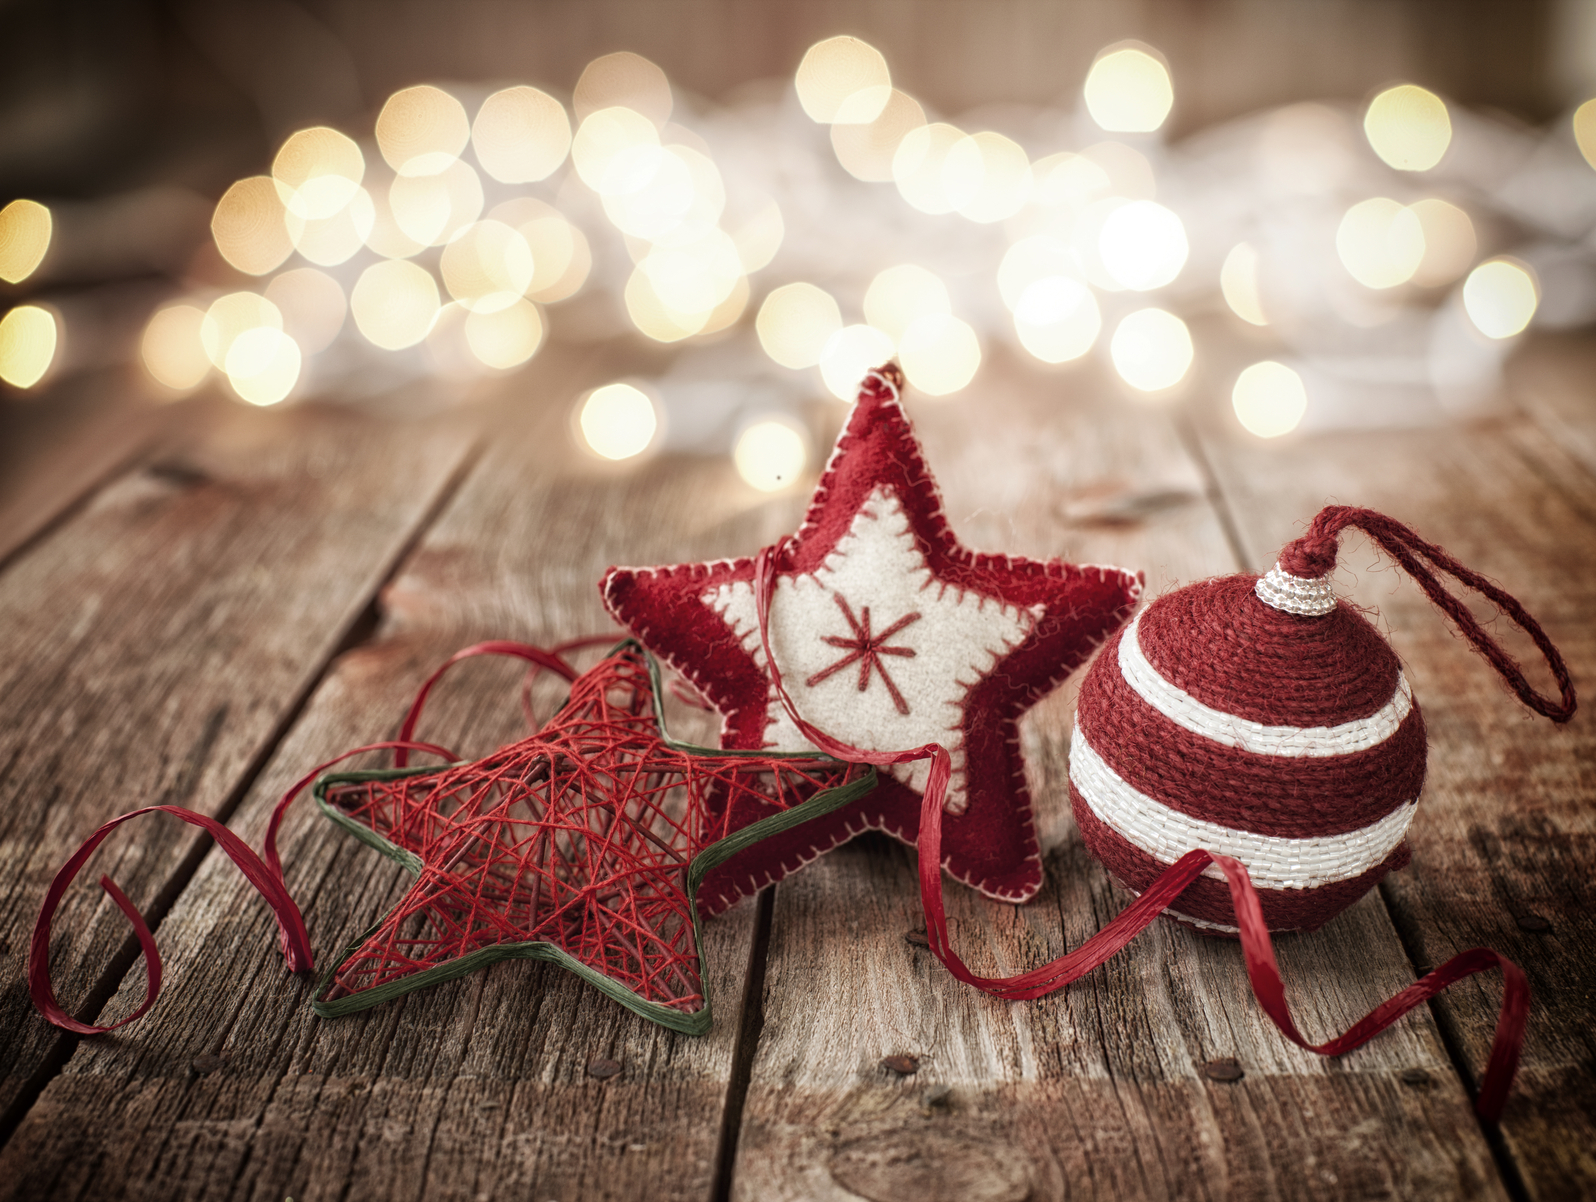 Saggezza Popolare A Natale Liberetà